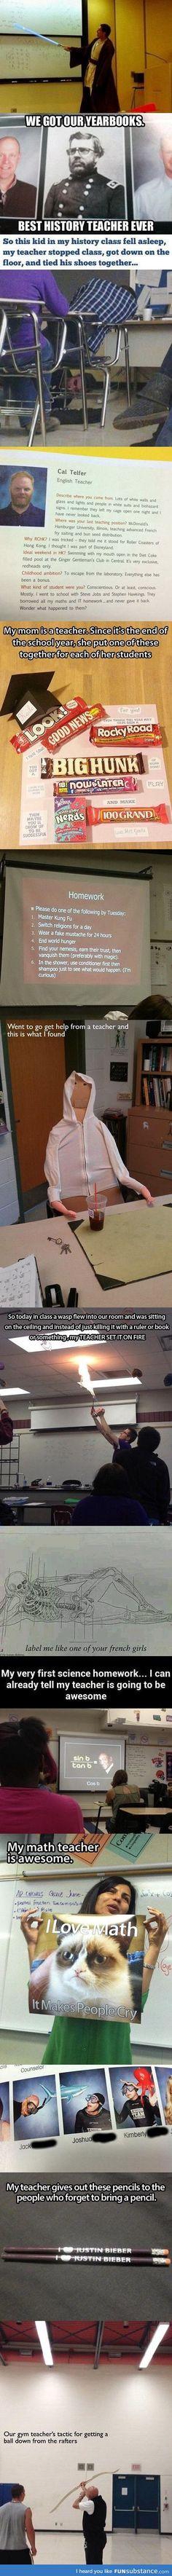 Teachers with a sense of humor